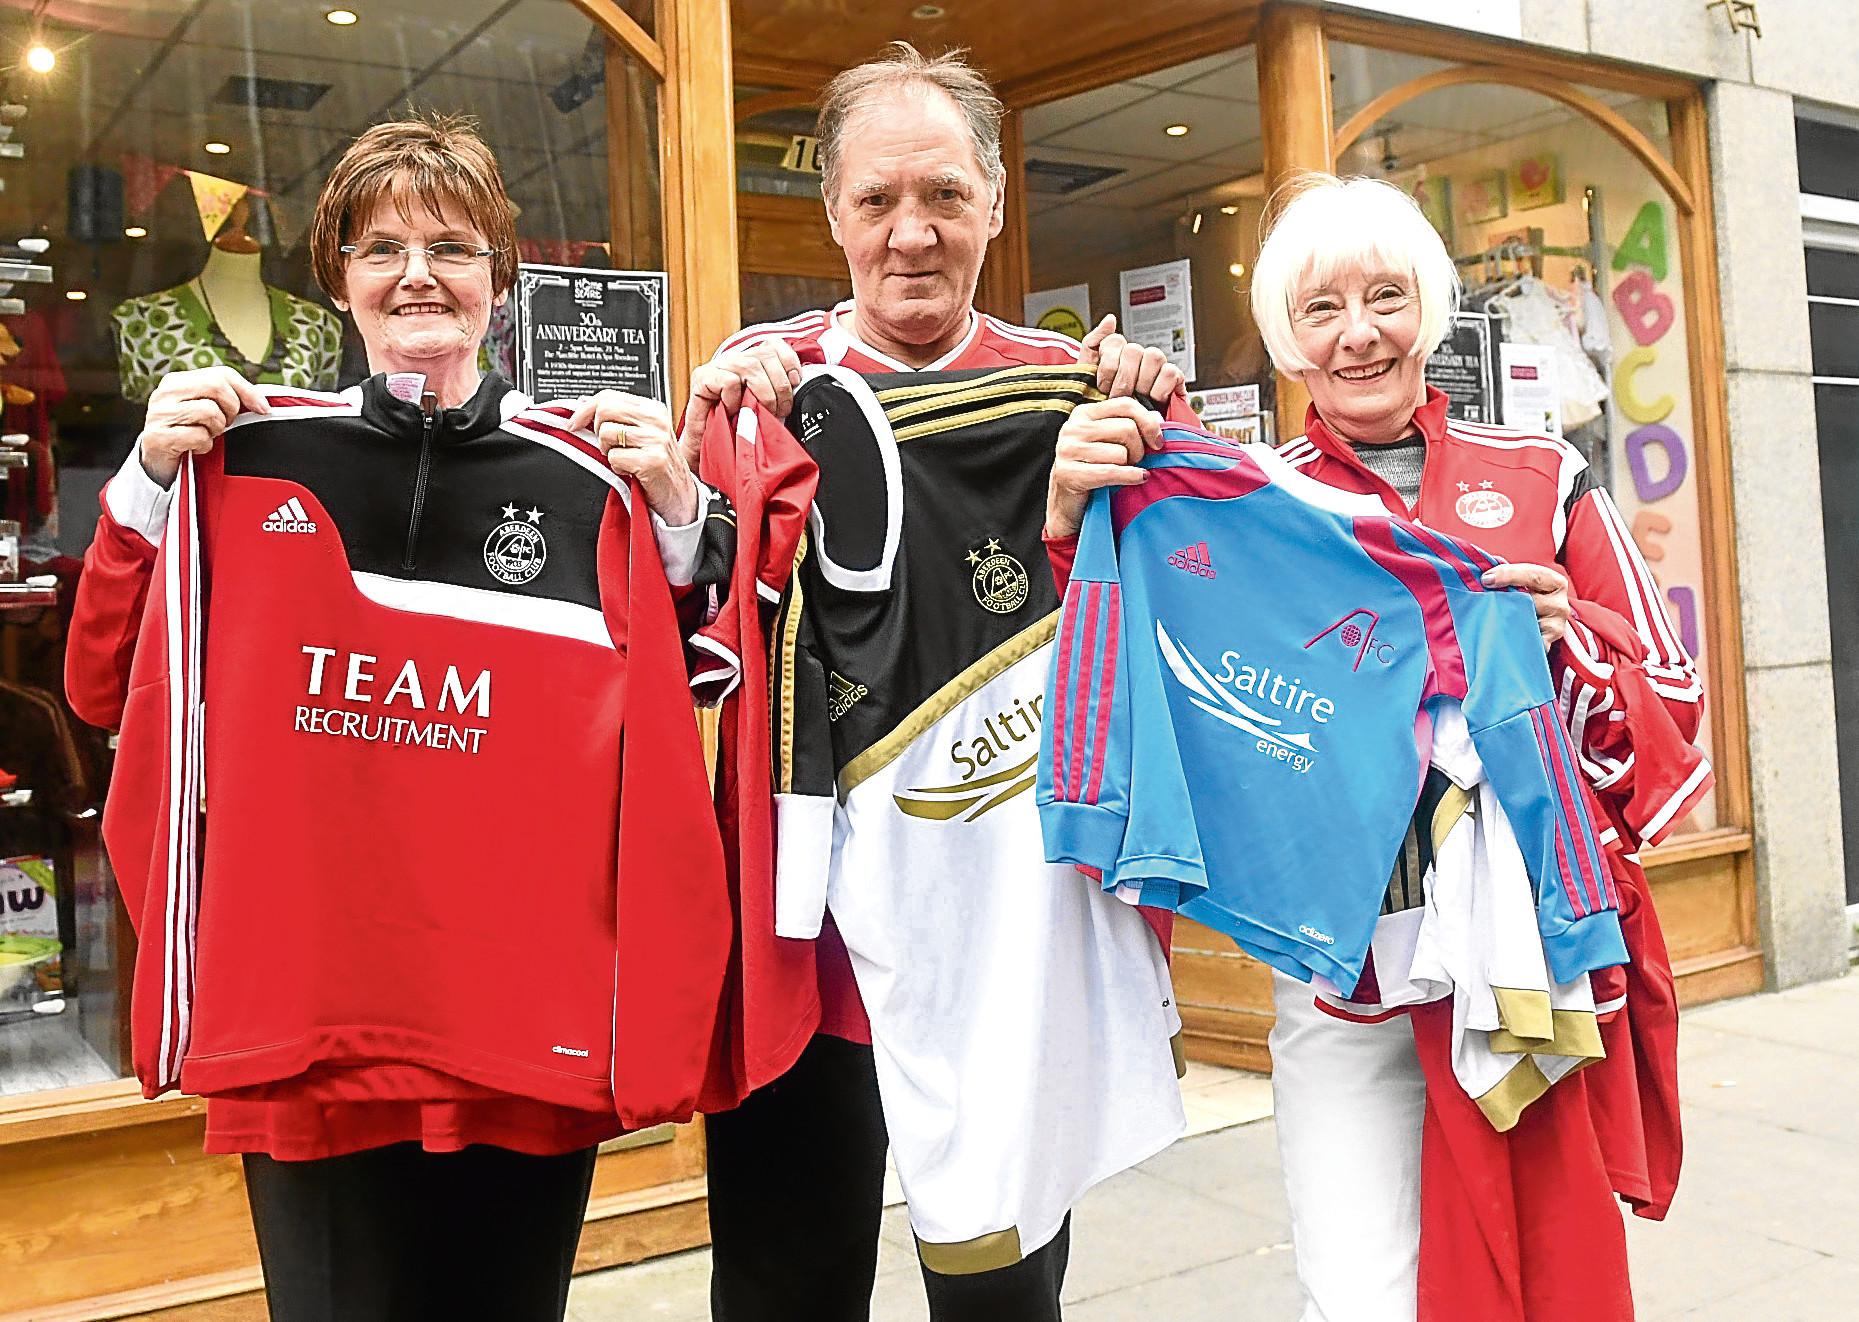 Charity volunteers Tricia Grieg, Gordon Mennis and Frances Davidson.